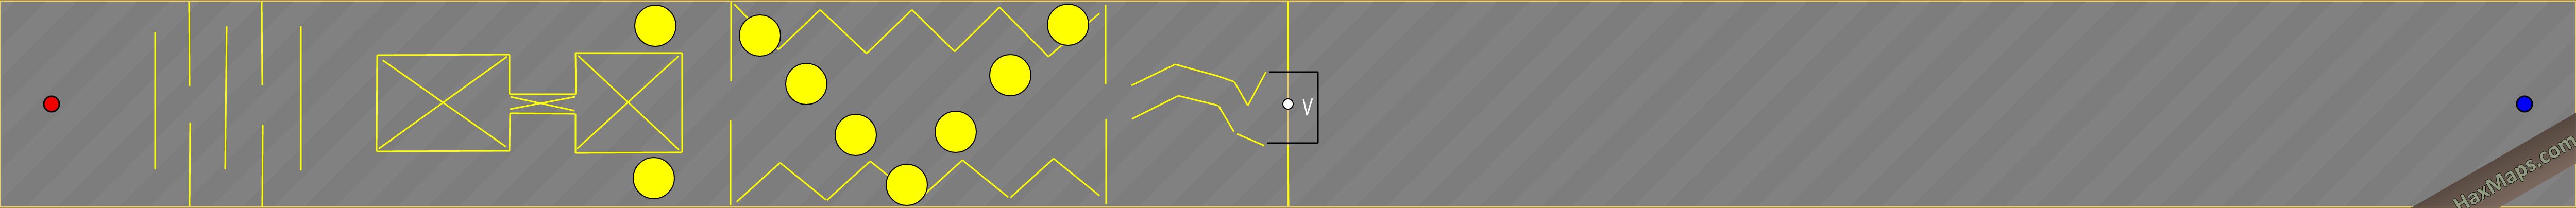 hax ball maps   Yellow2